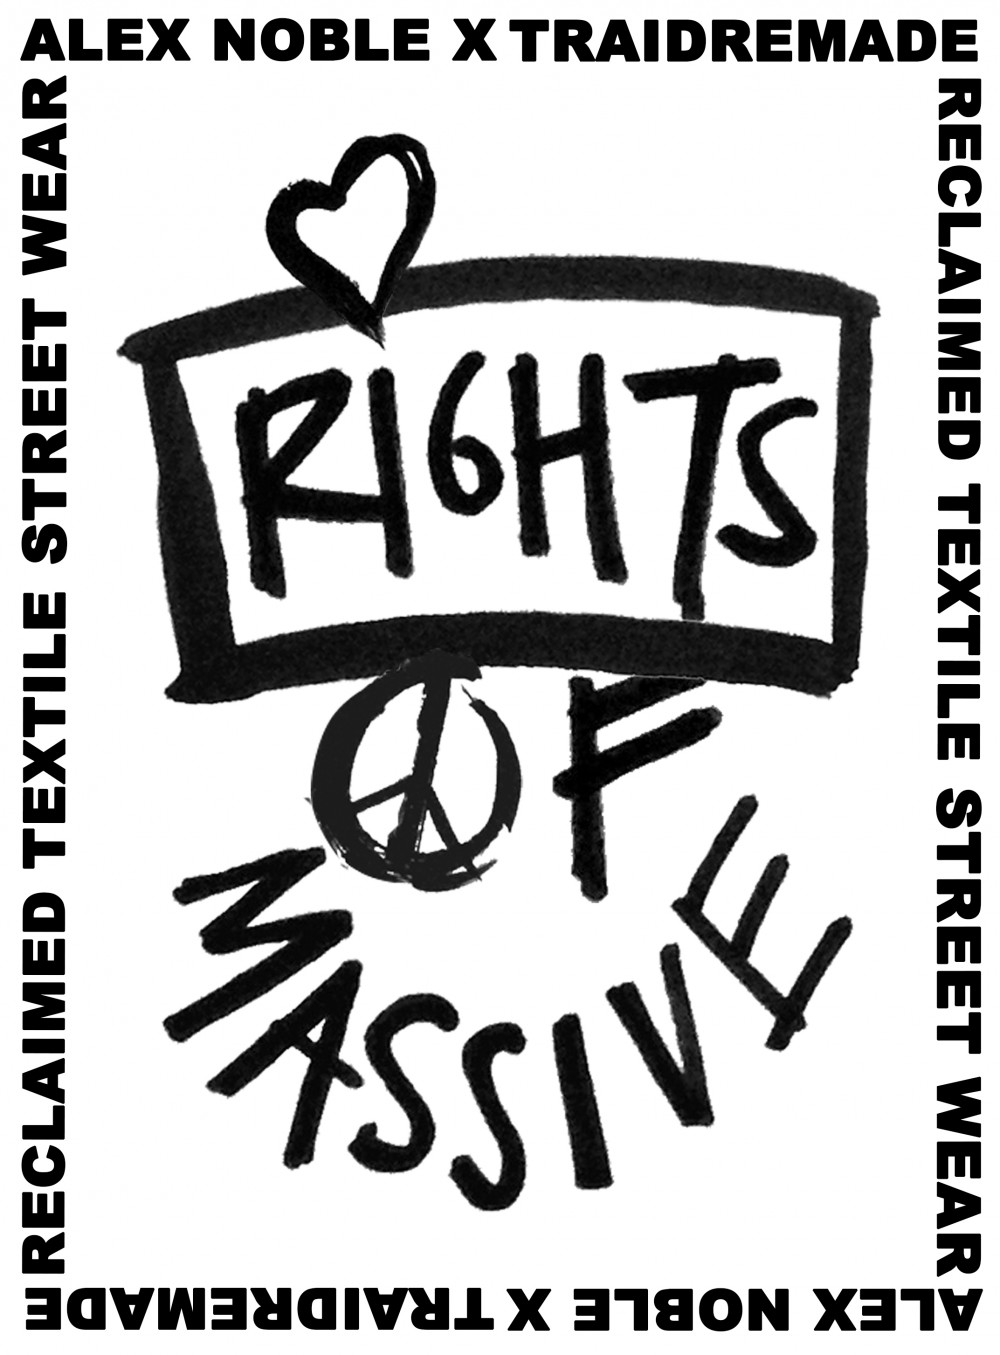 Rights of Massive